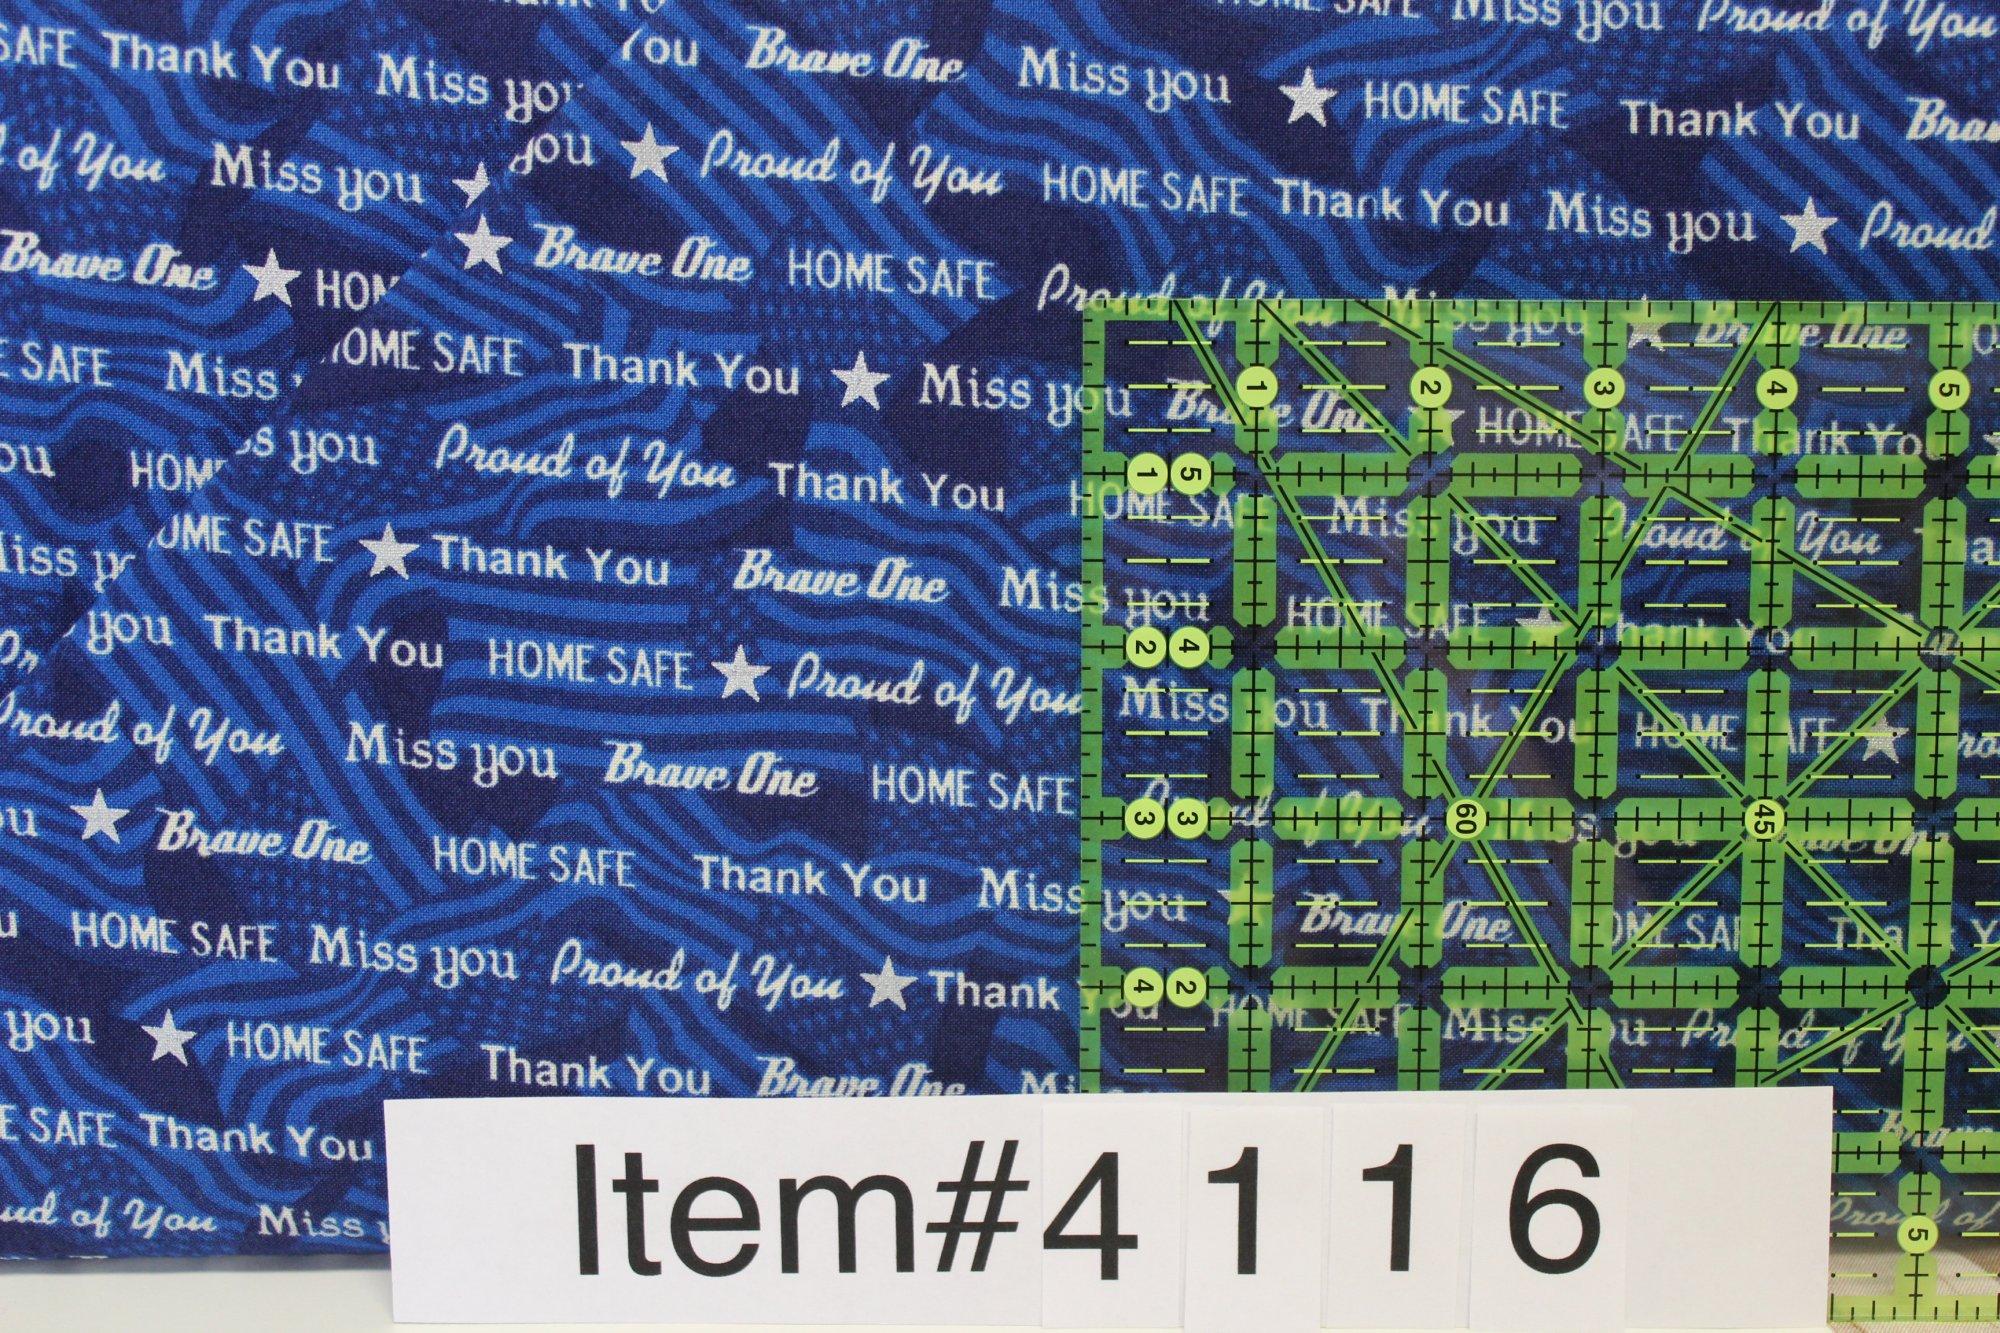 Item#4116 - Let Freedom Ring - Quilting Treasures - Kensington Studio - Bolt 4116